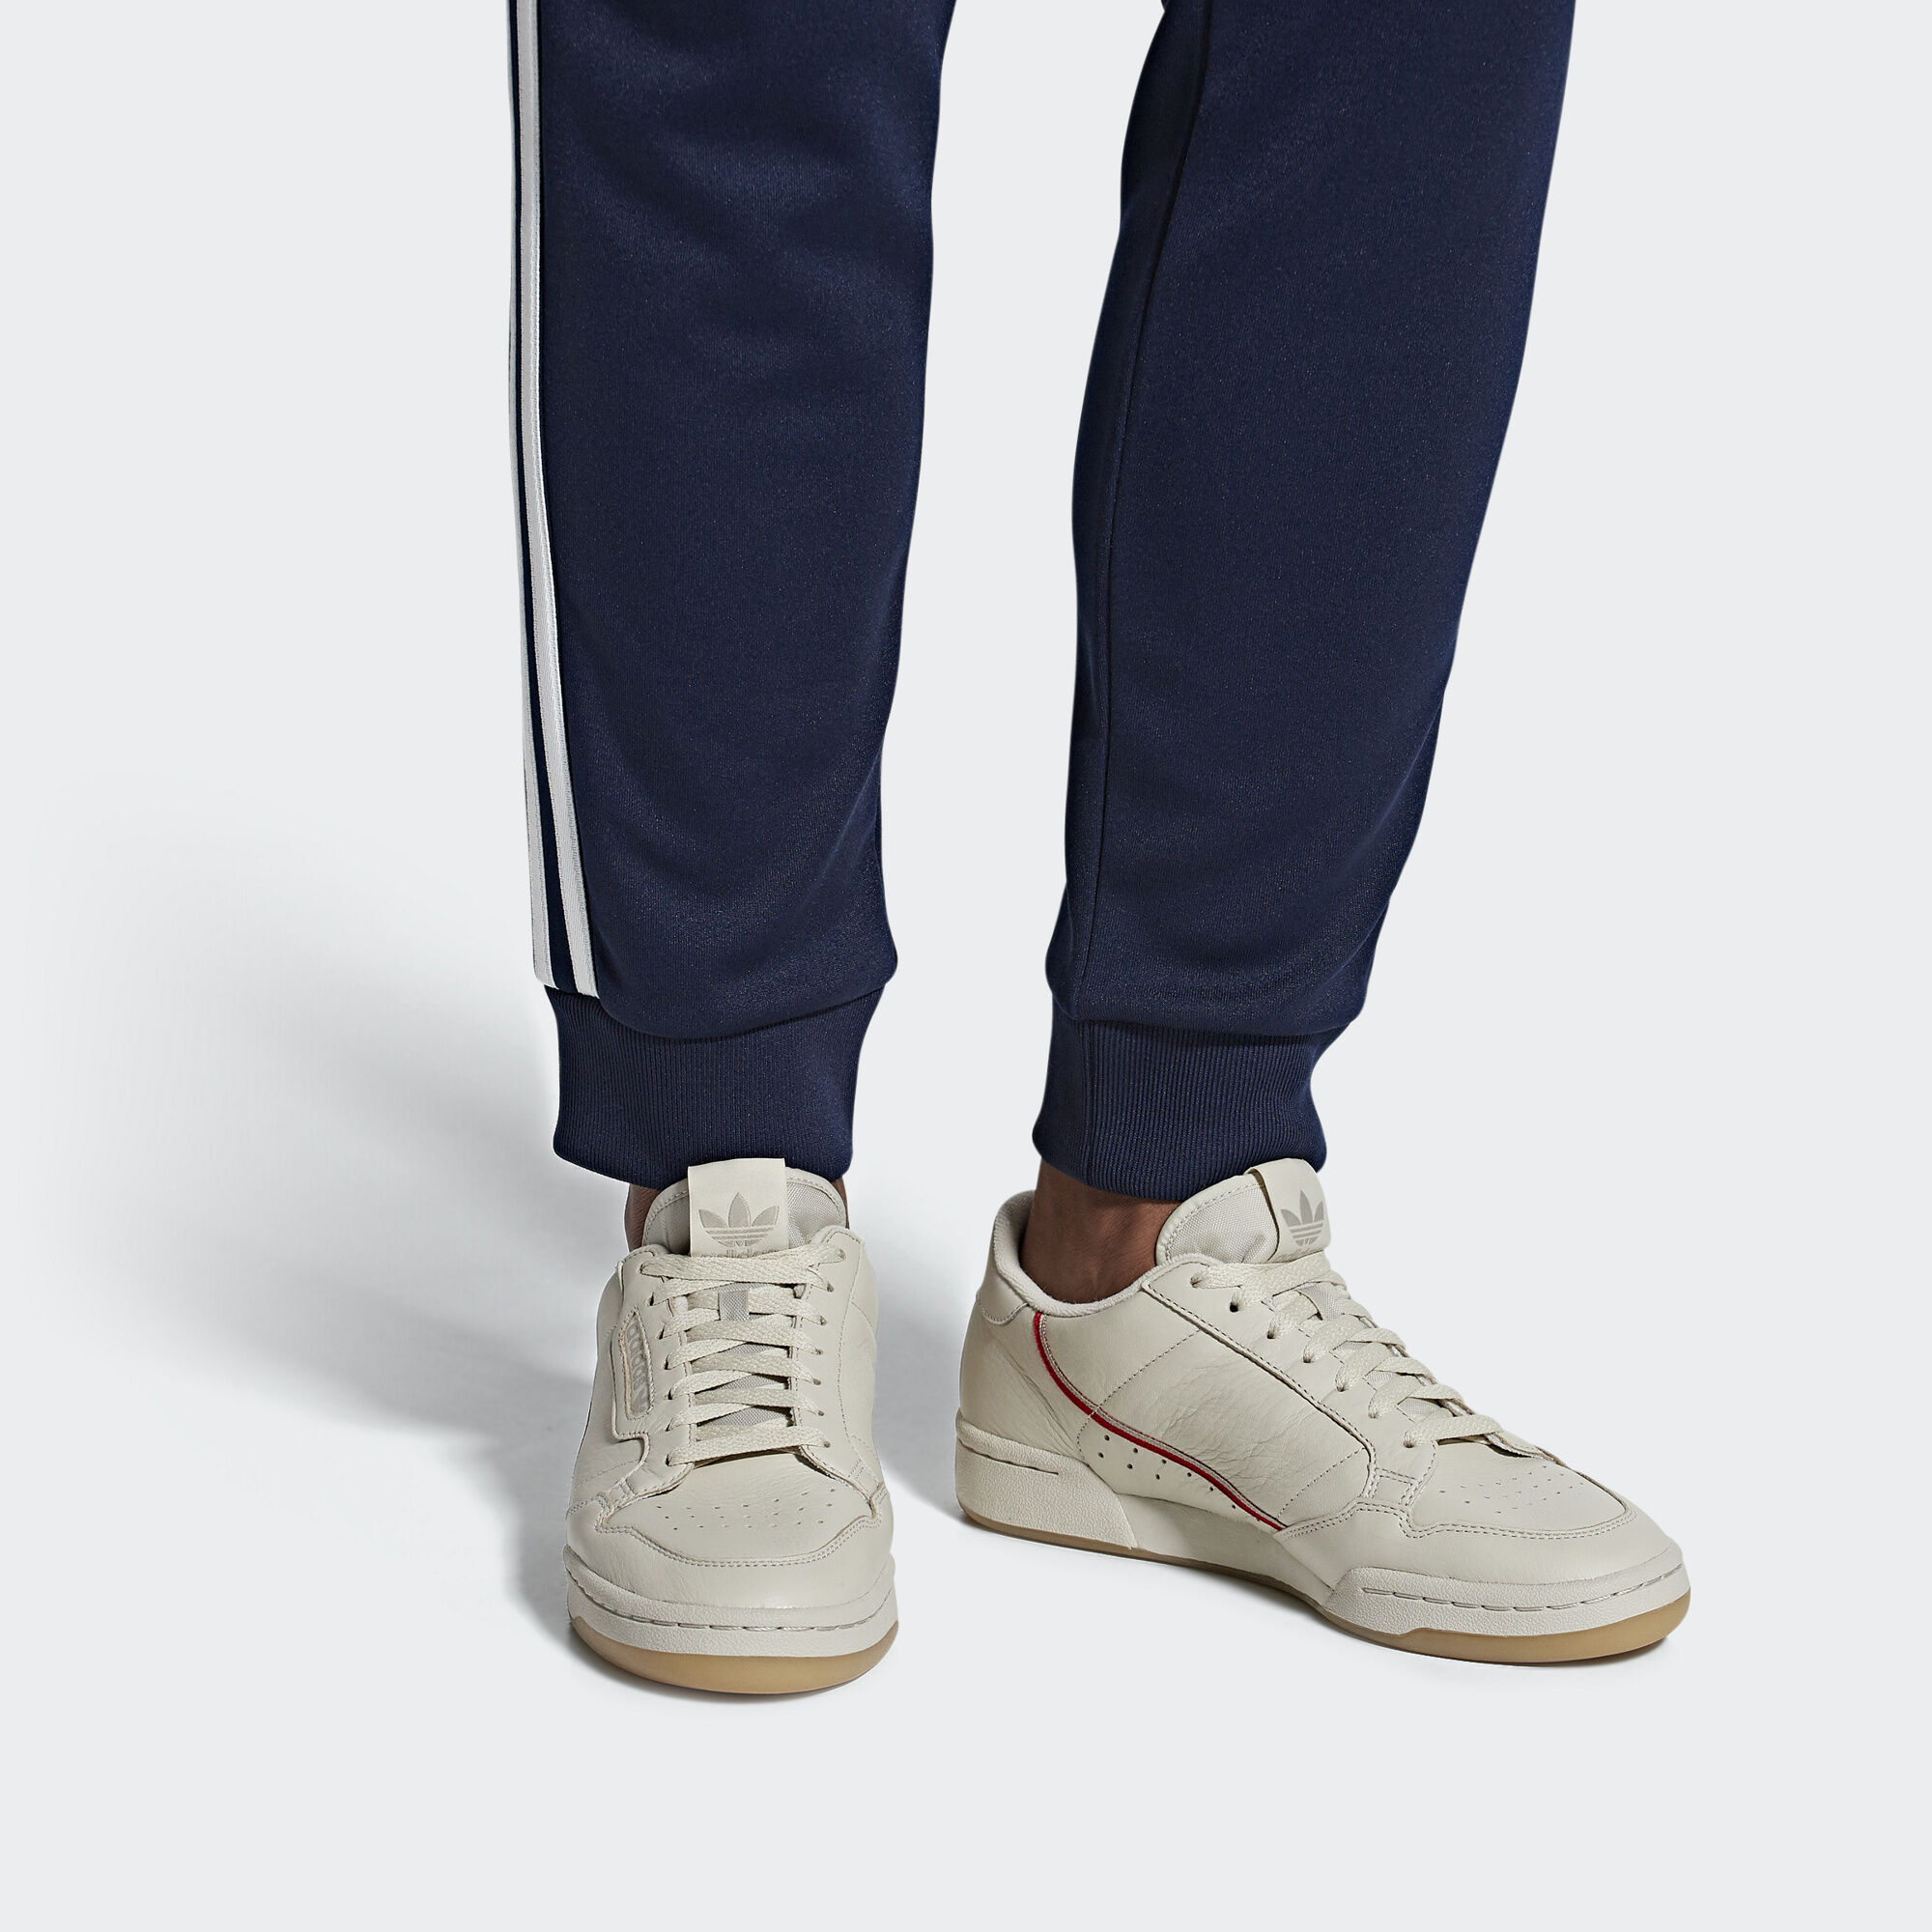 new styles 4e67f 380e5 adidas Sapatos Continental 80 - Branco  adidas MLT